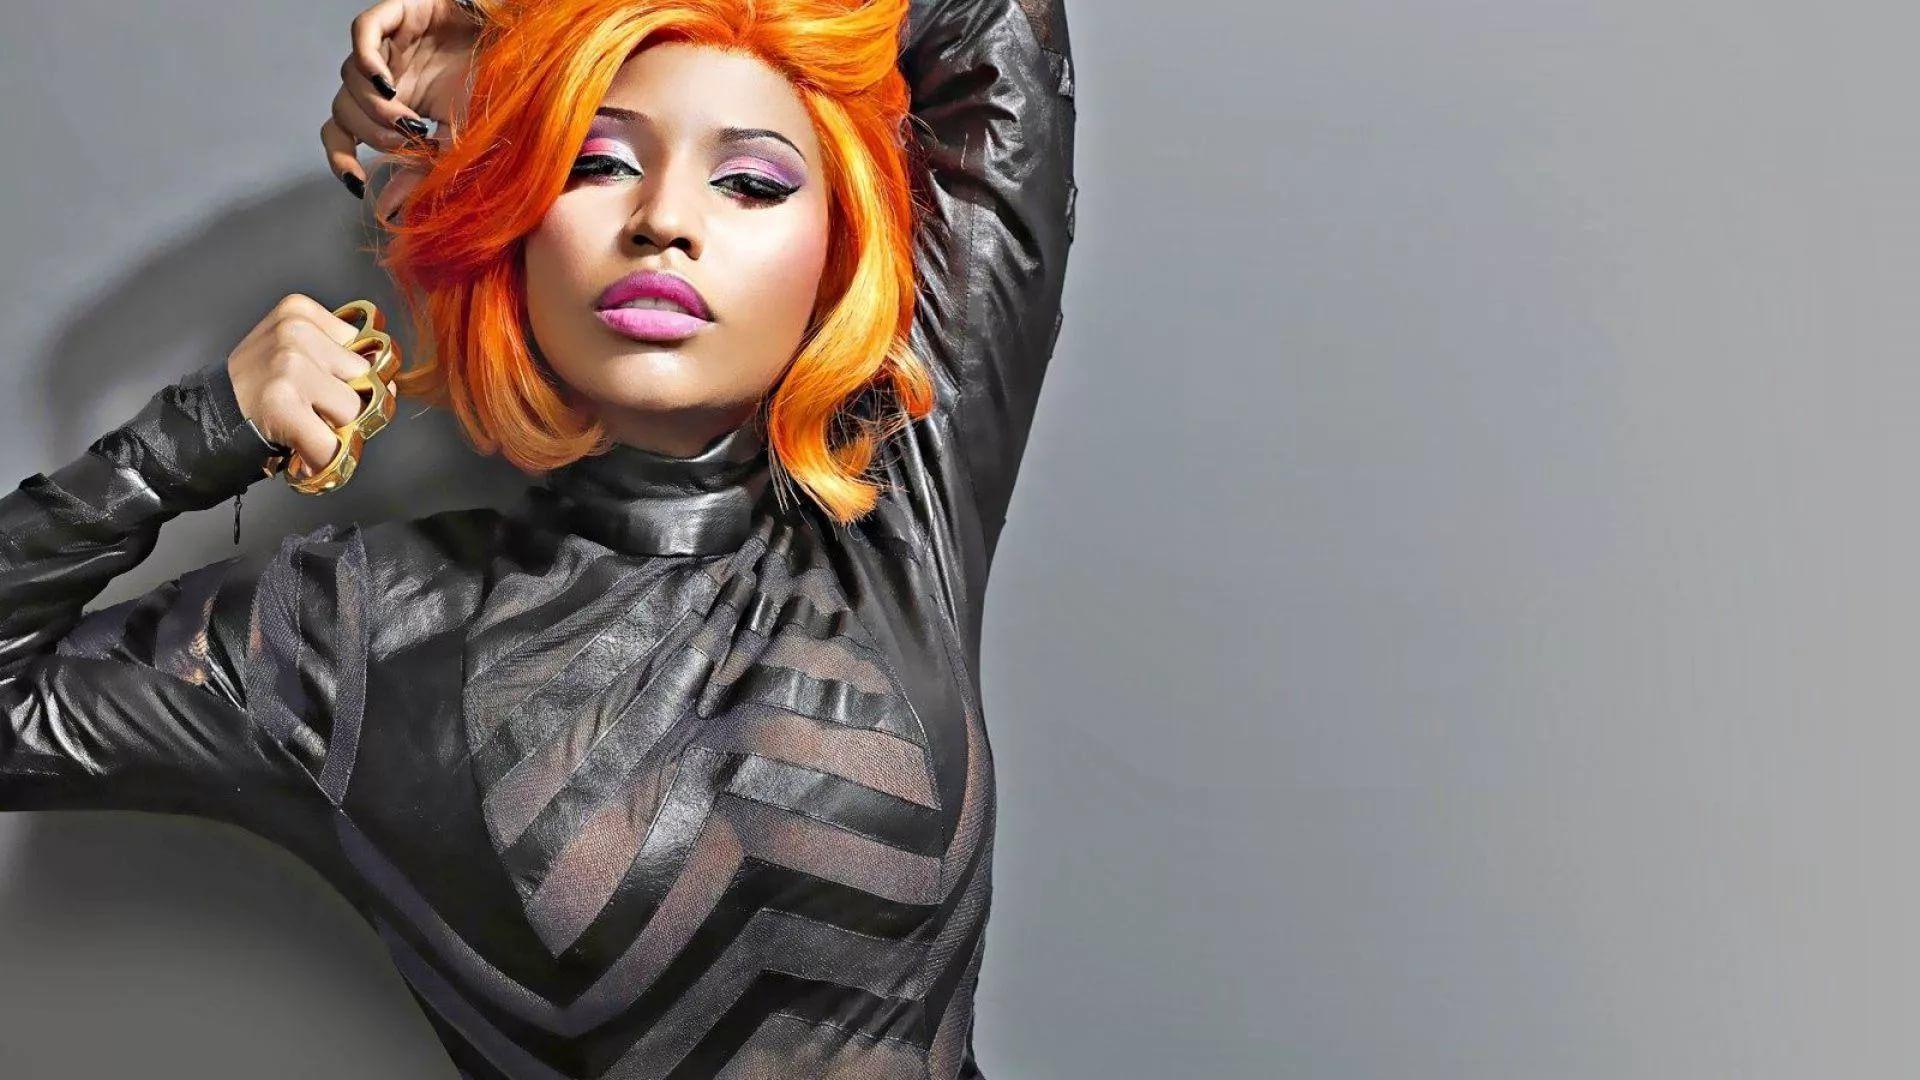 Nicki Minaj desktop wallpaper download